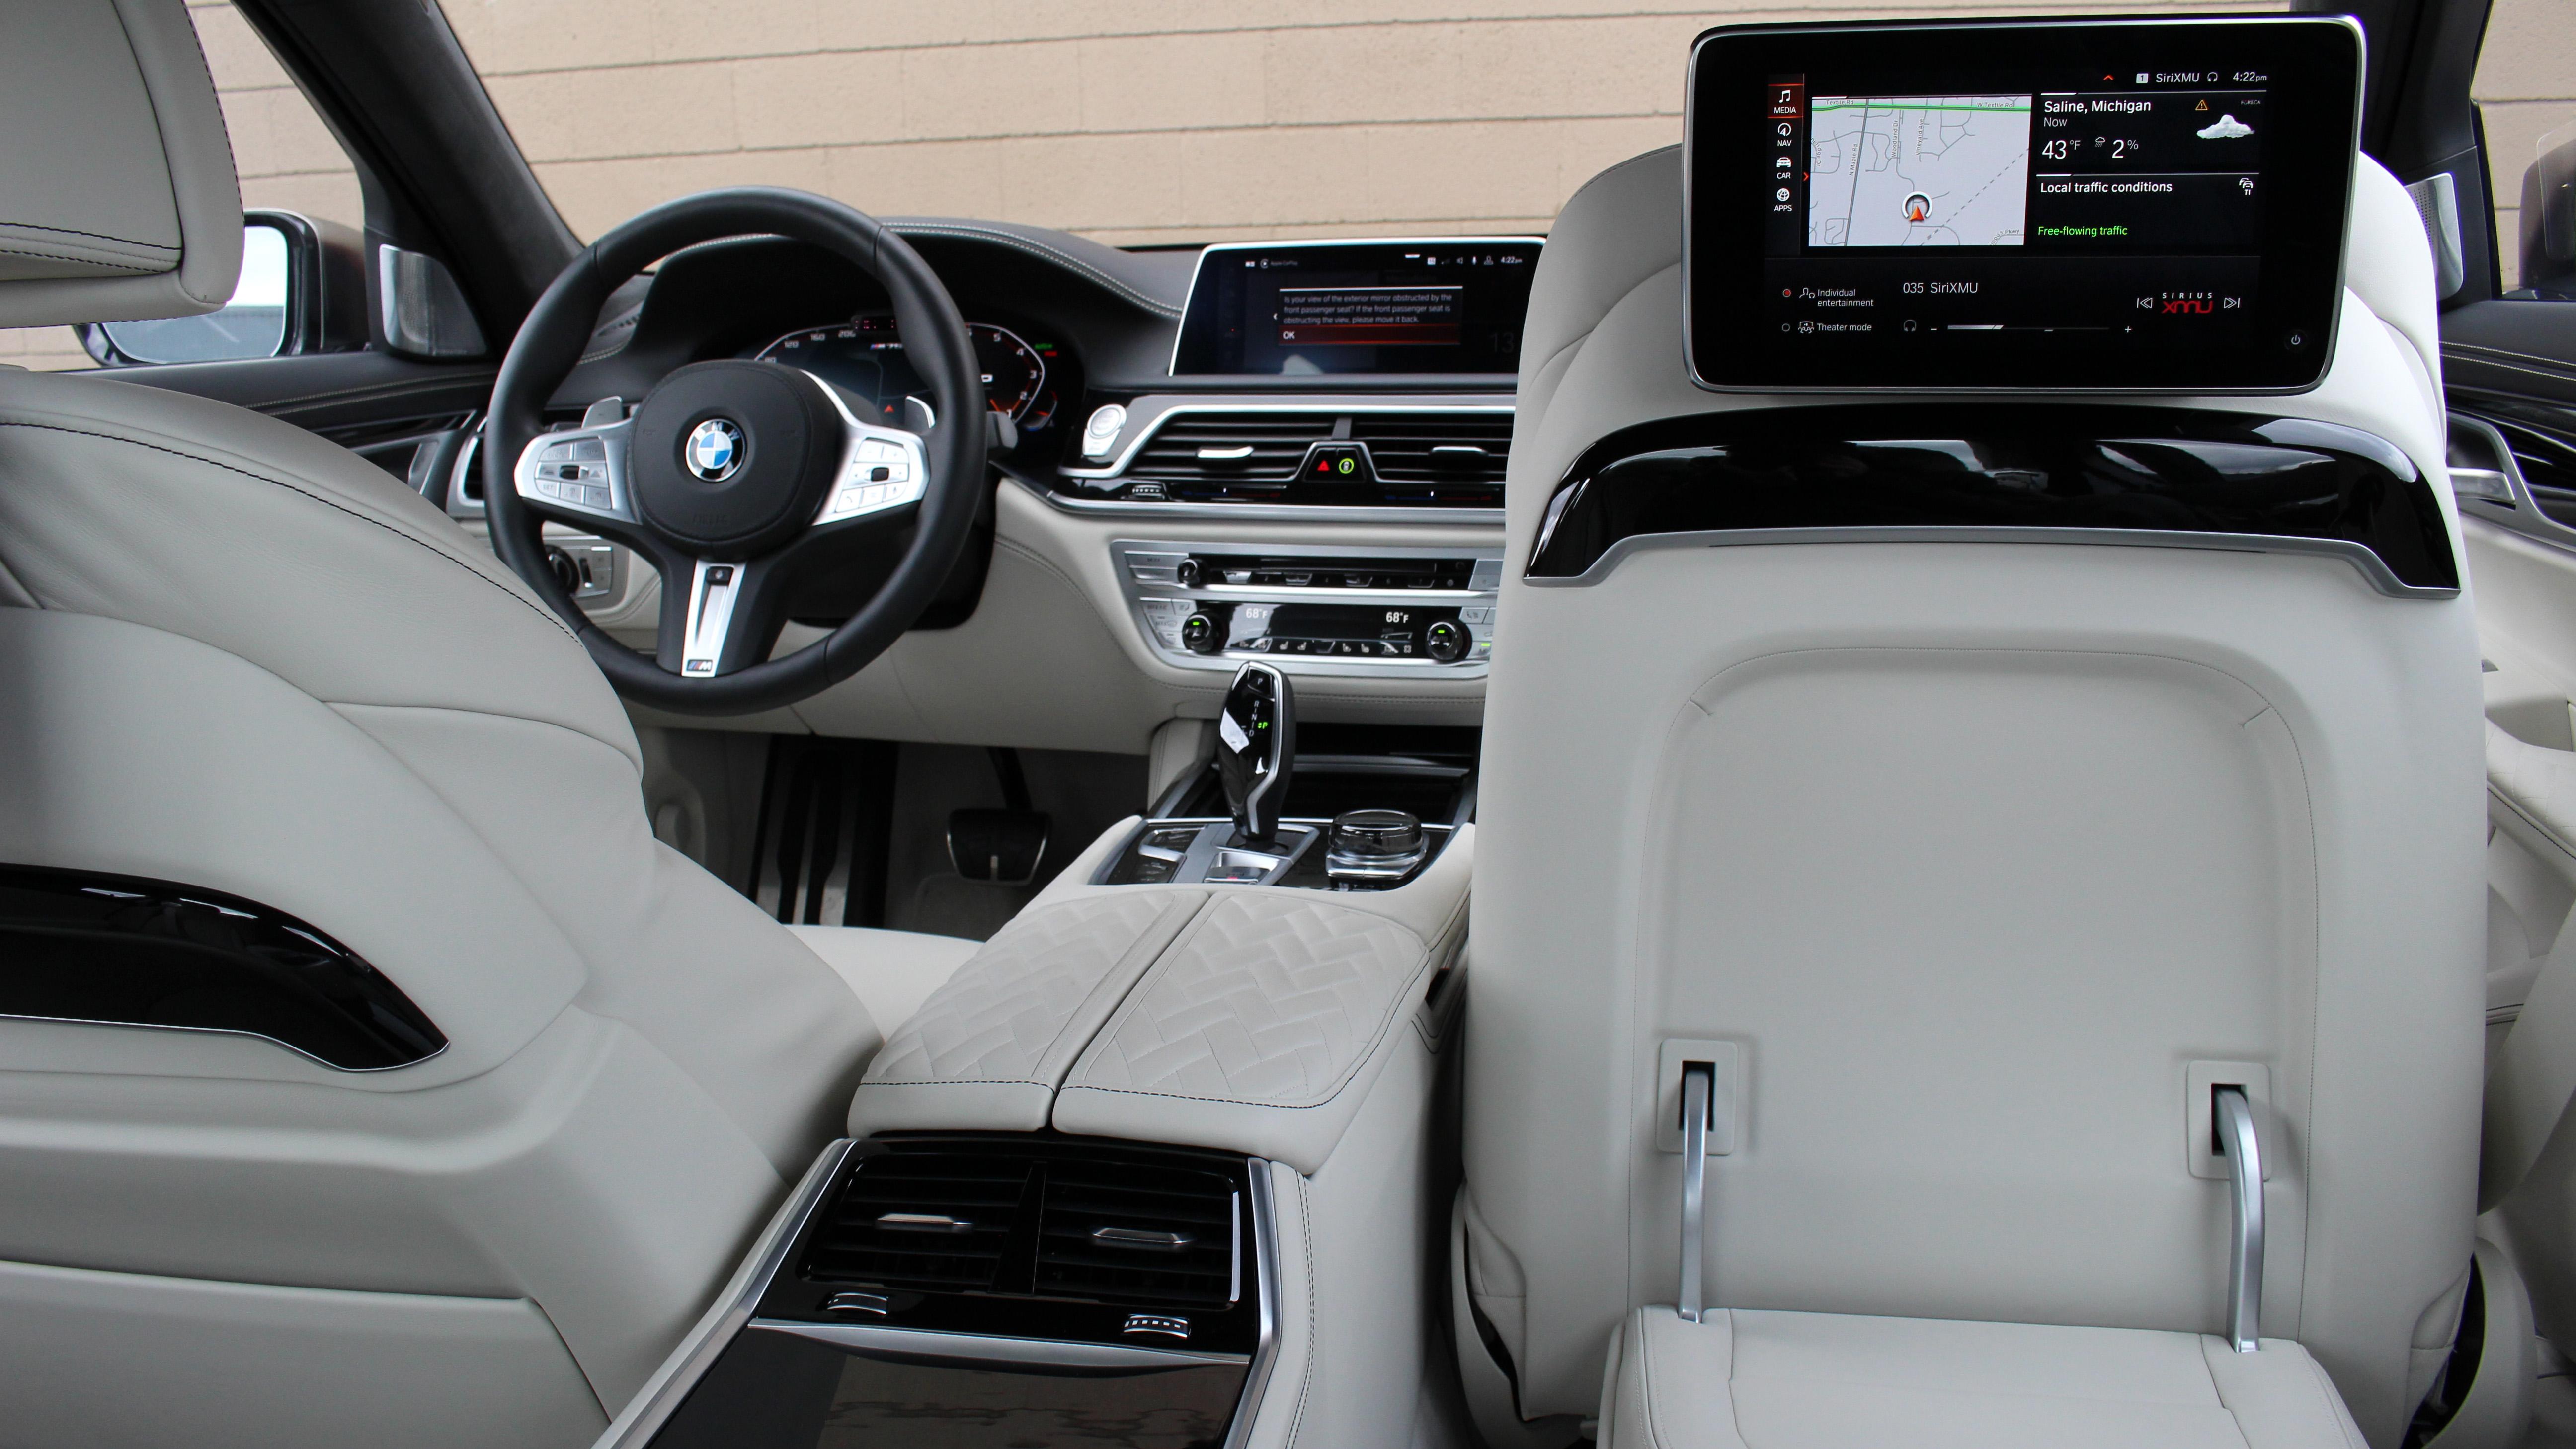 2020 Bmw 7 Series Interior Driveway Test Photos Tech Features Autoblog